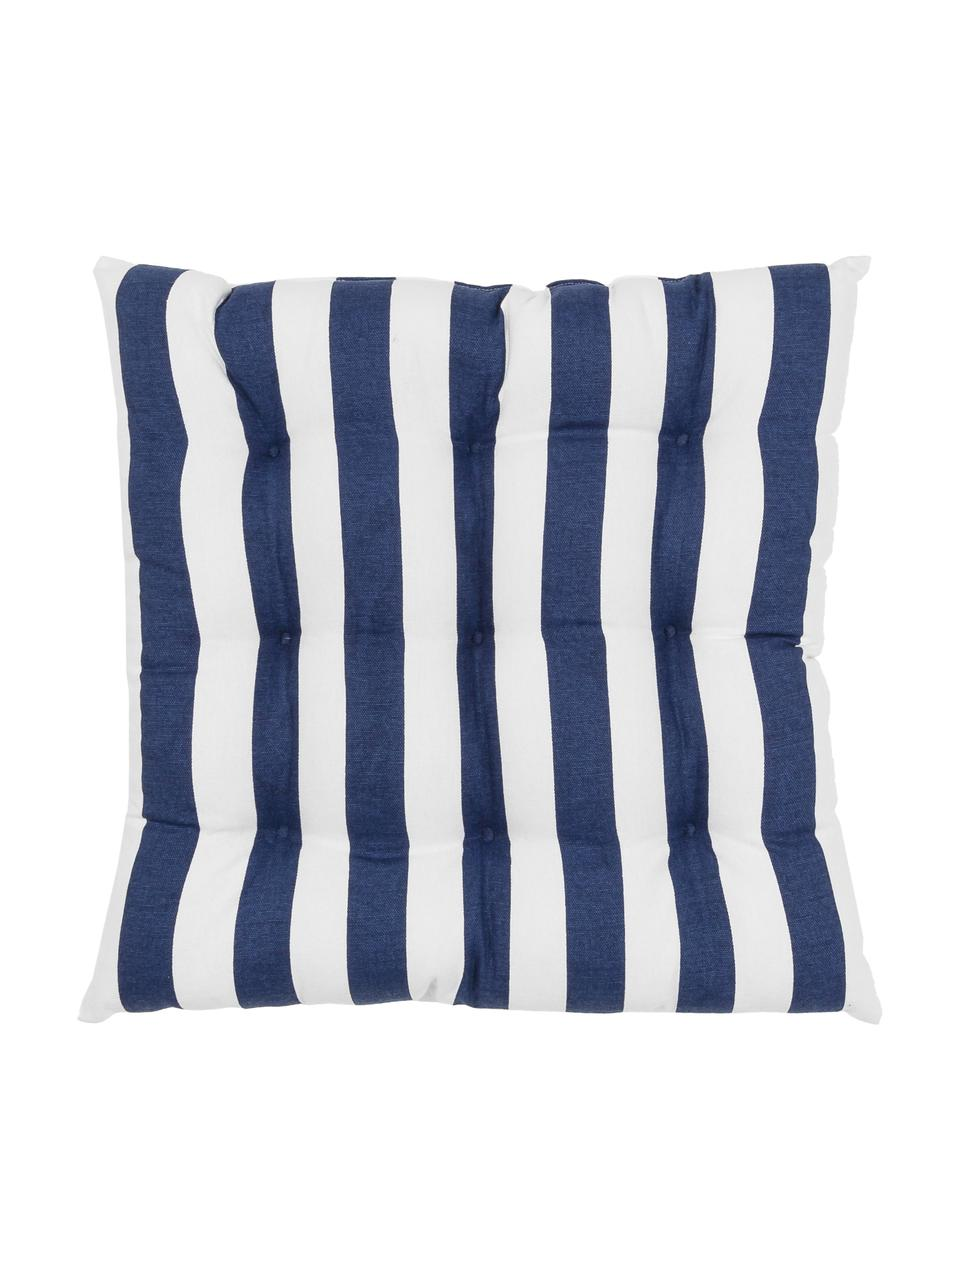 Gestreept stoelkussen Timon in donkerblauw/wit, Donkerblauw, wit, 40 x 40 cm